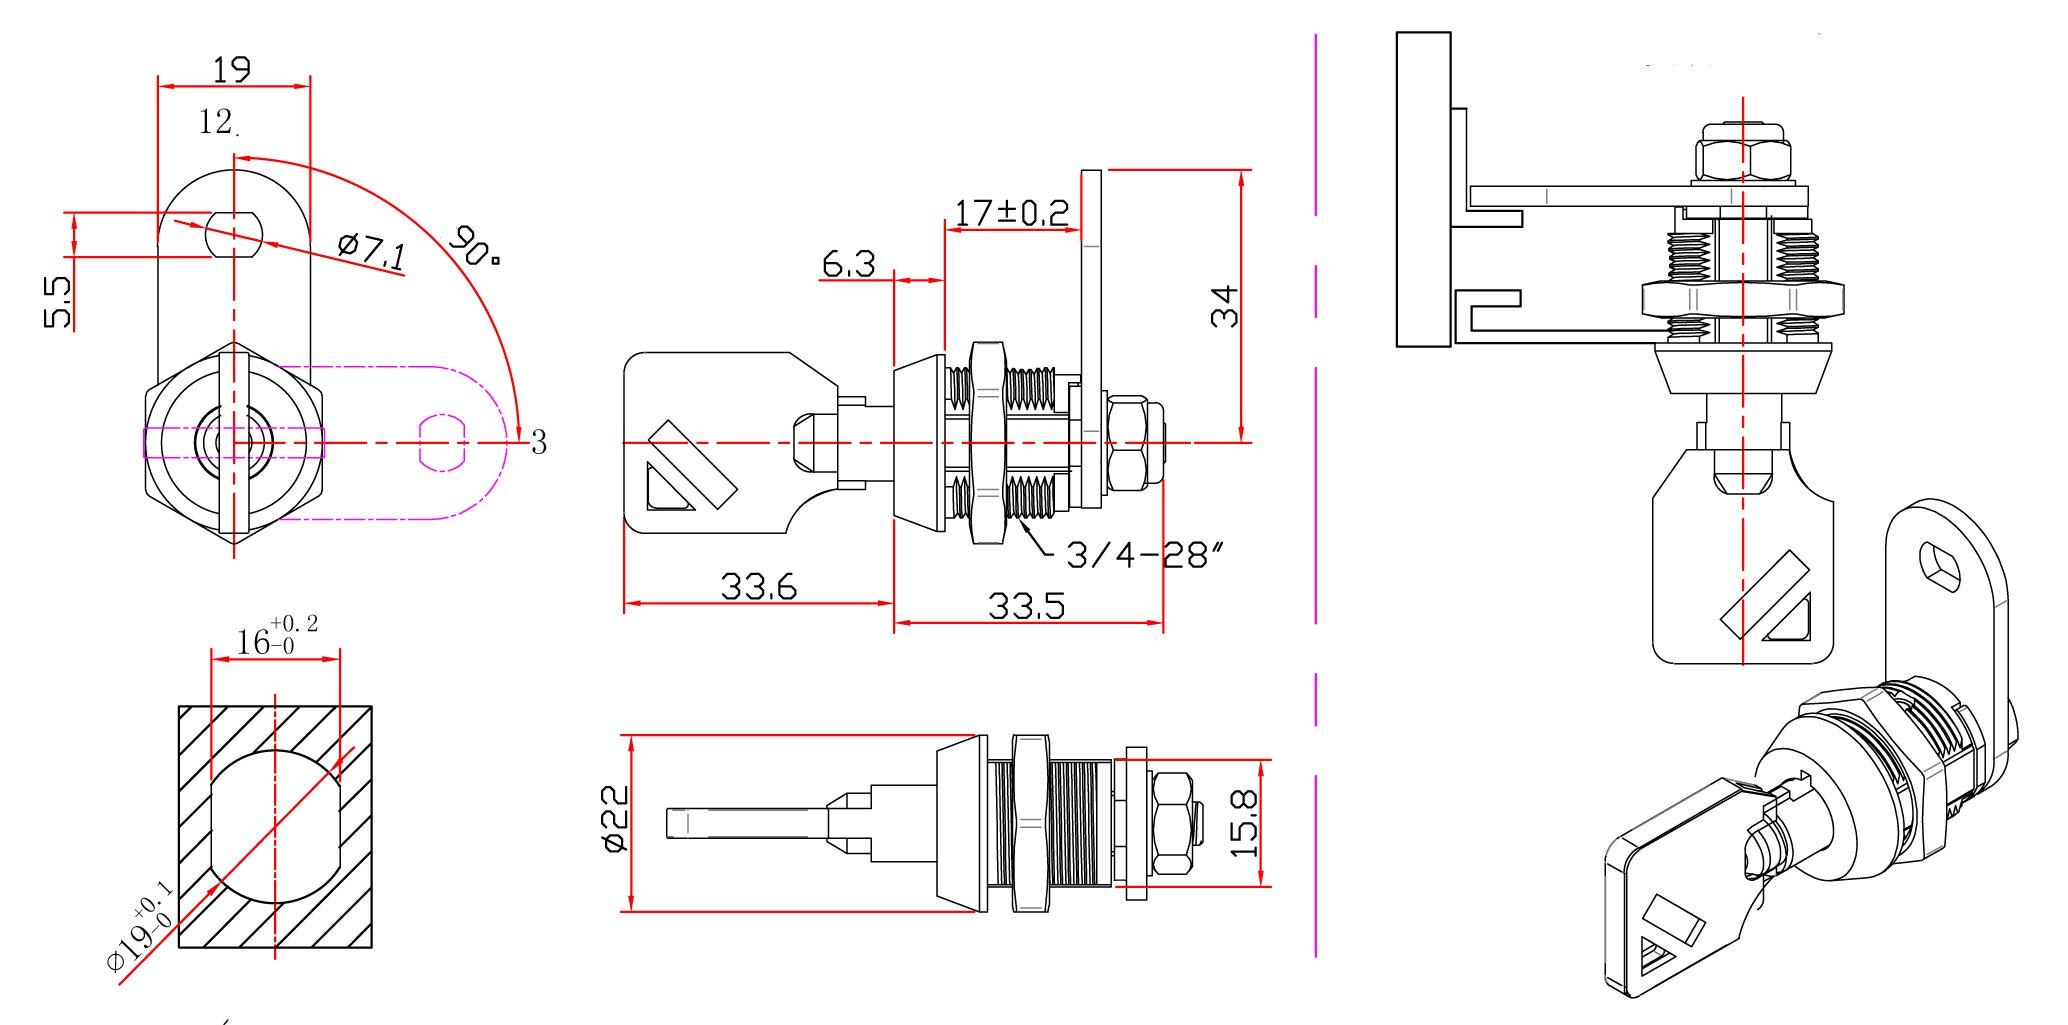 Tubular Cam Lock with Chrome Finish, Keyed Alike Removable Key (5/8'', Pack of 5) by Products Quad (Image #2)